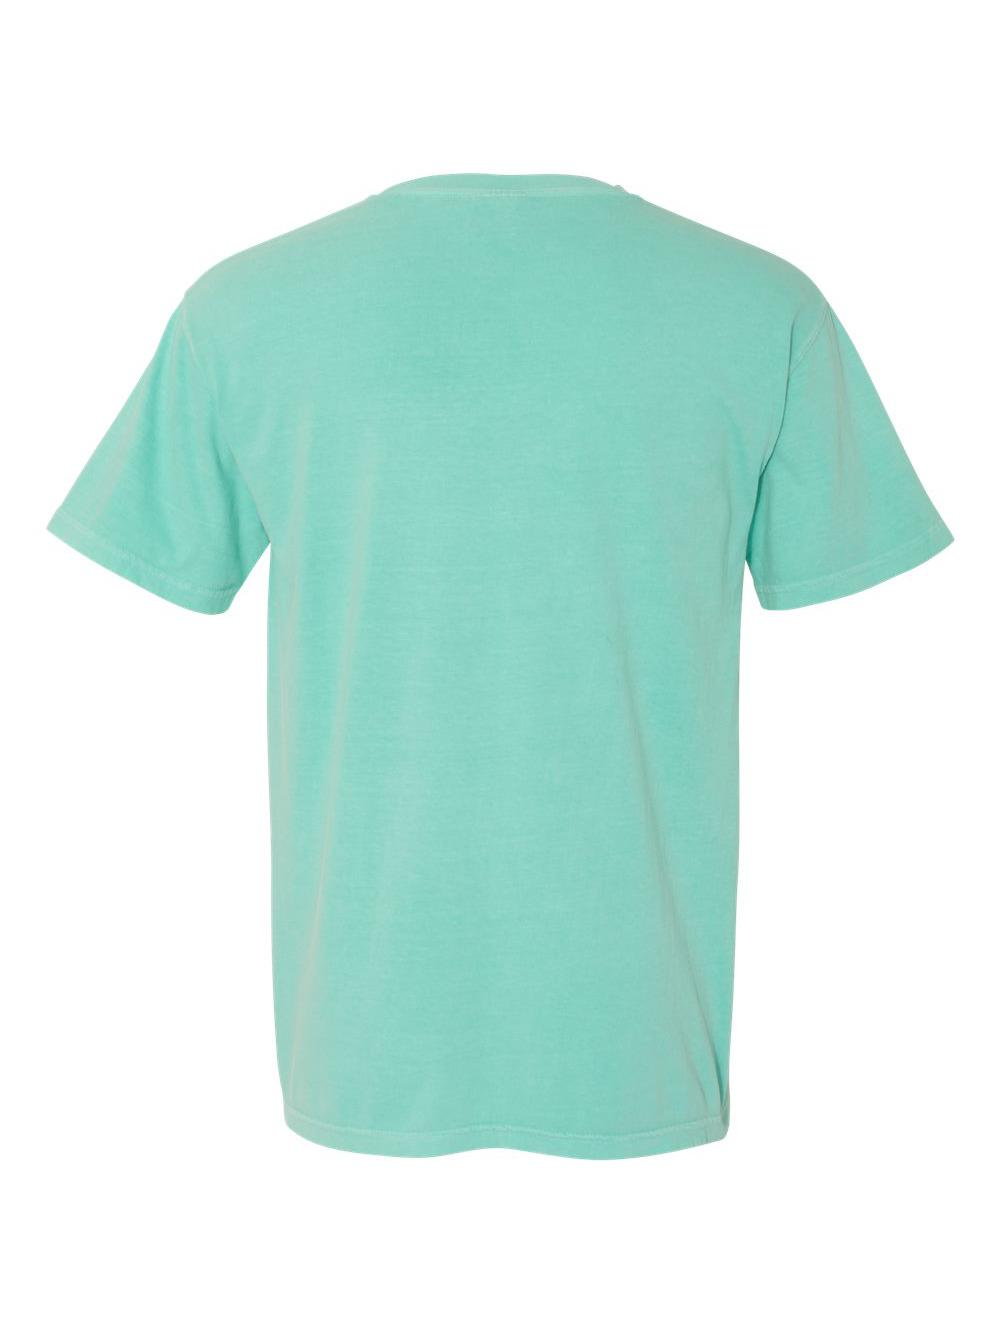 Comfort-Colors-Garment-Dyed-Heavyweight-Ringspun-Short-Sleeve-Shirt-1717 thumbnail 31